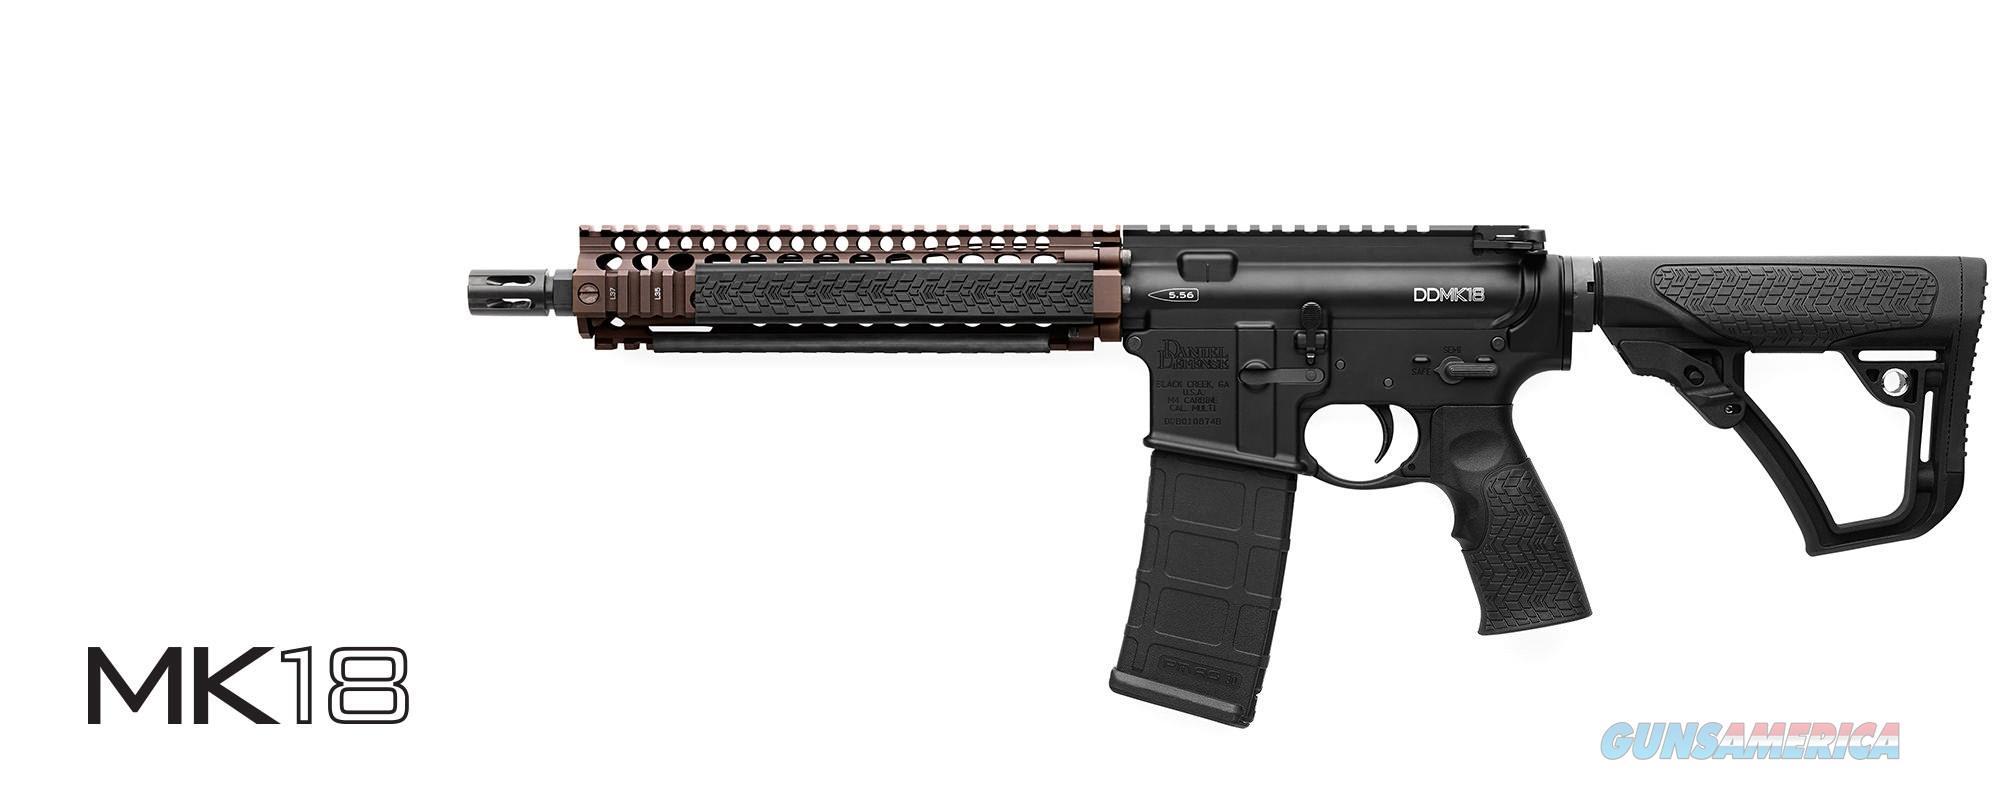 IN STOCK - DANIEL DEFENSE BLK/FDE MK18 SBR - USE WHAT THEY USE (M4 AR15) 02-088-17024 FDE Rail/Black Gun  Guns > Rifles > Daniel Defense > Complete Rifles